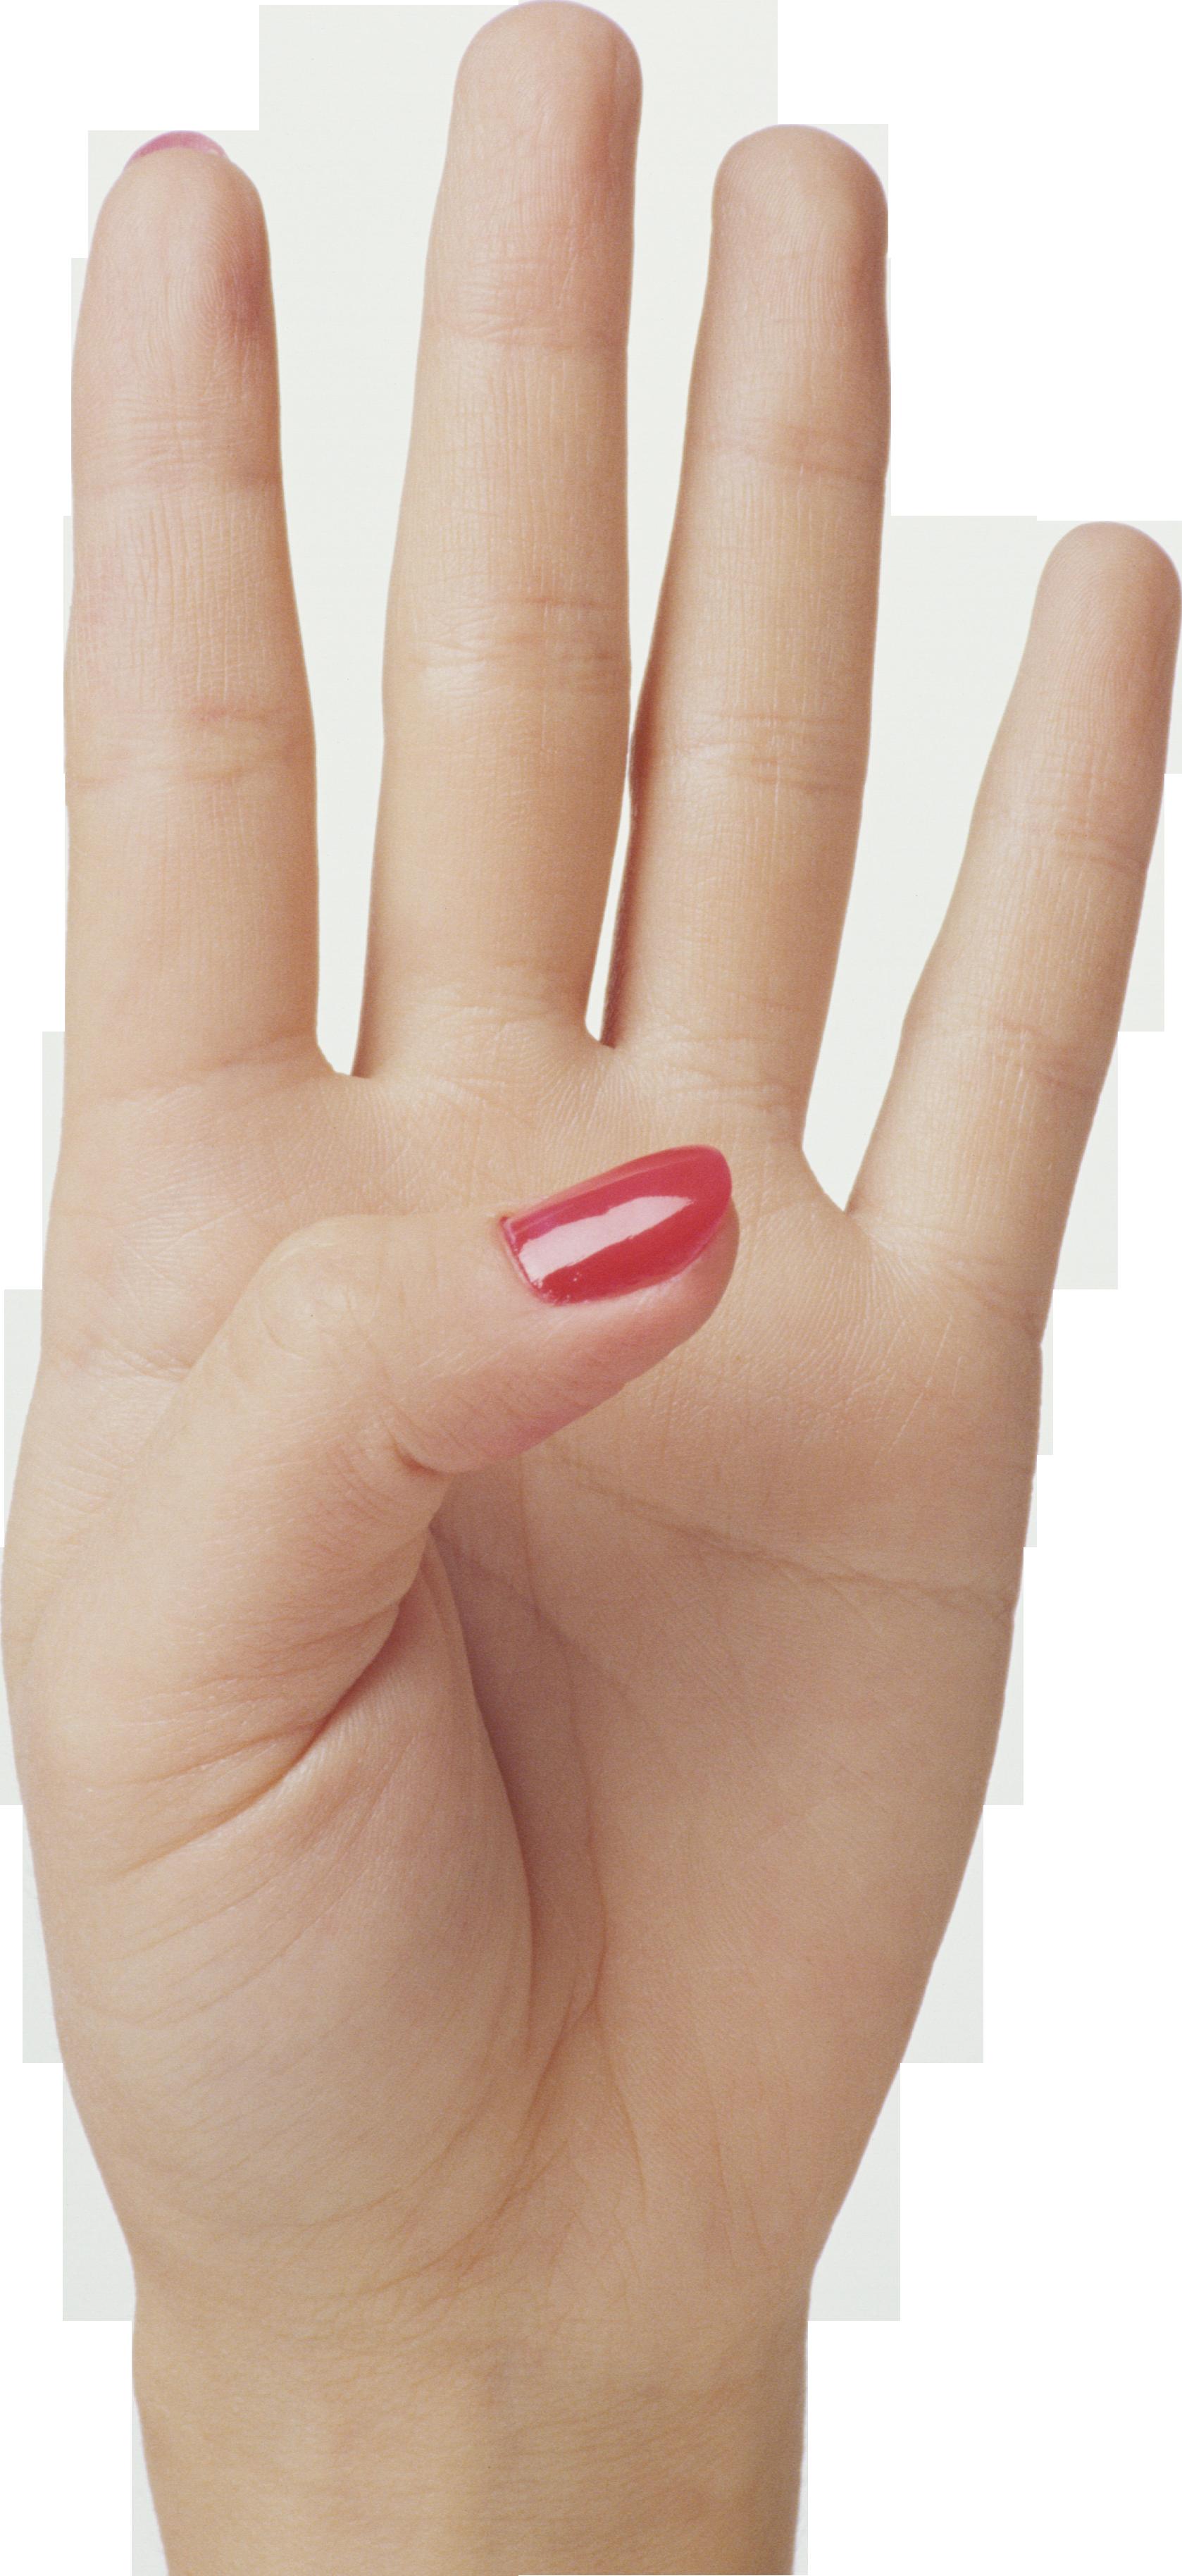 Four Finger Hand Png Image Finger Hands Lexus Logo Free Clip Art